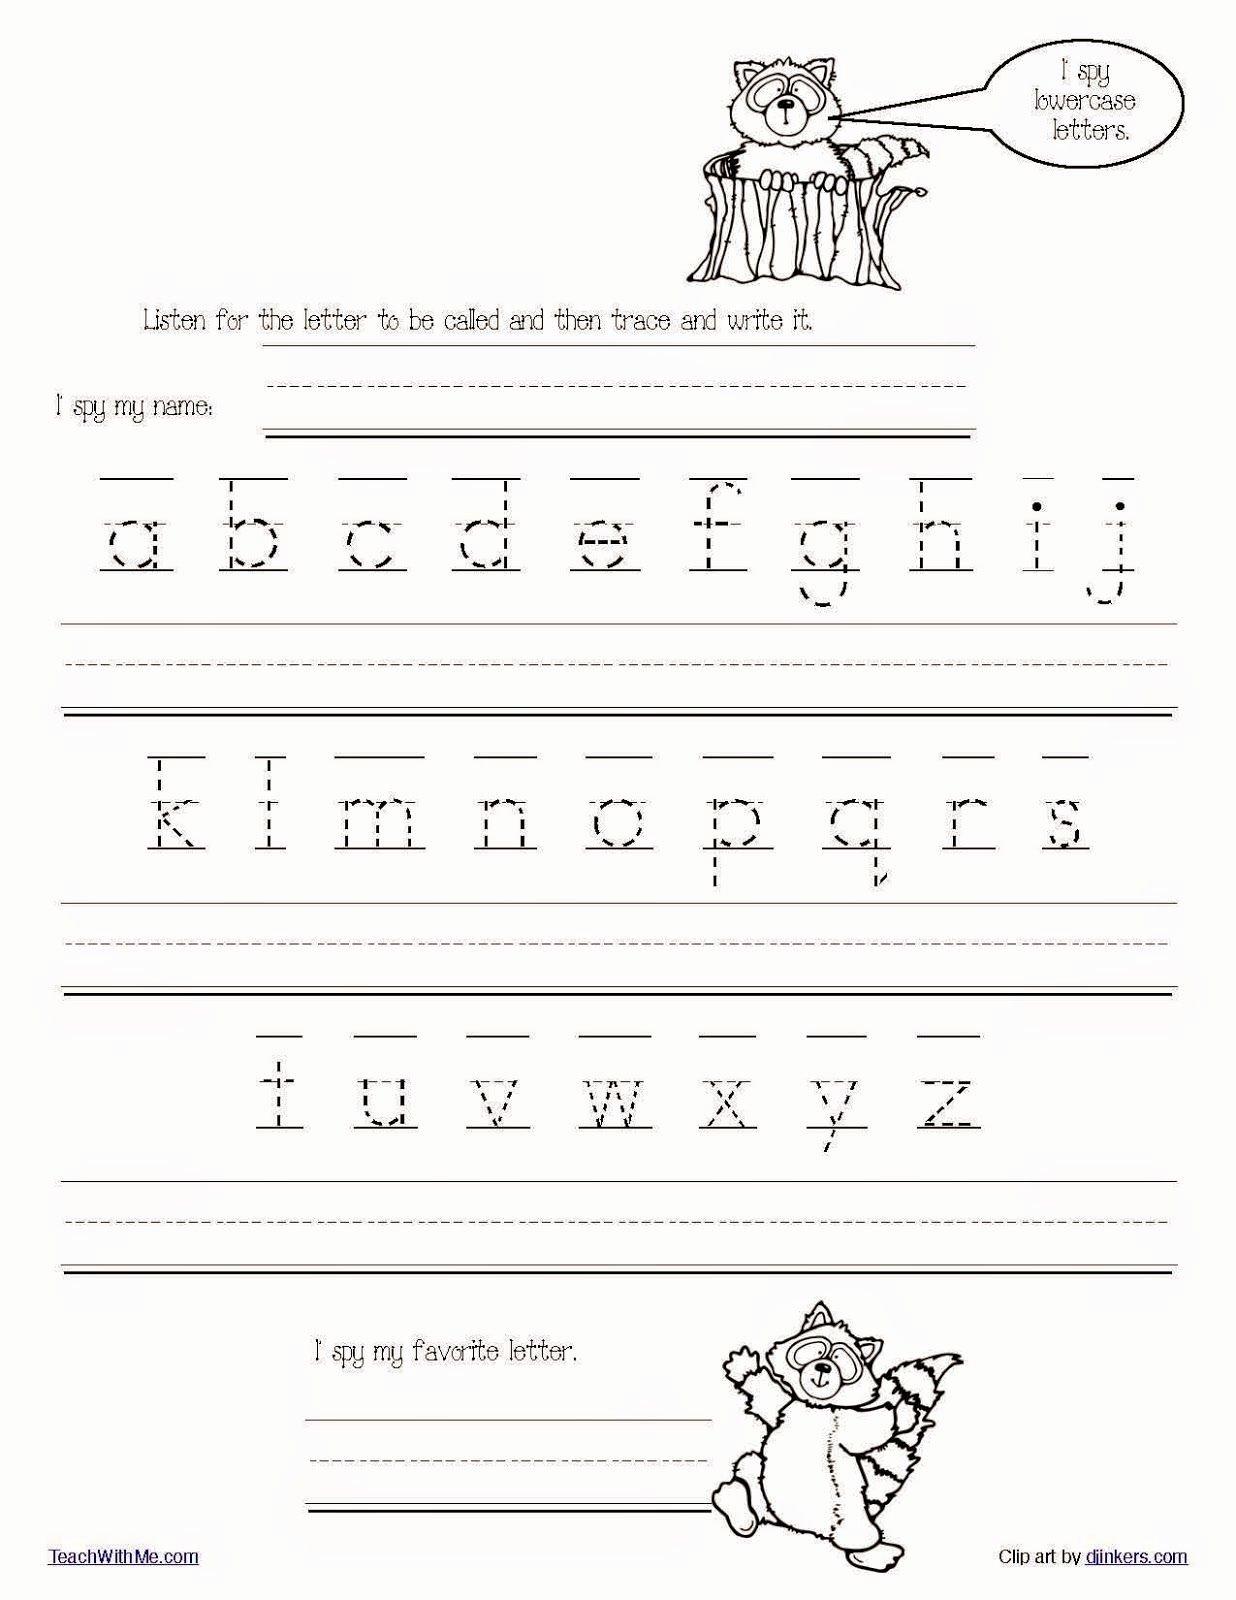 Free Printable Handwriting Worksheets for Preschoolers Printable Worksheets Math Worksheet Free Printable Handwriting